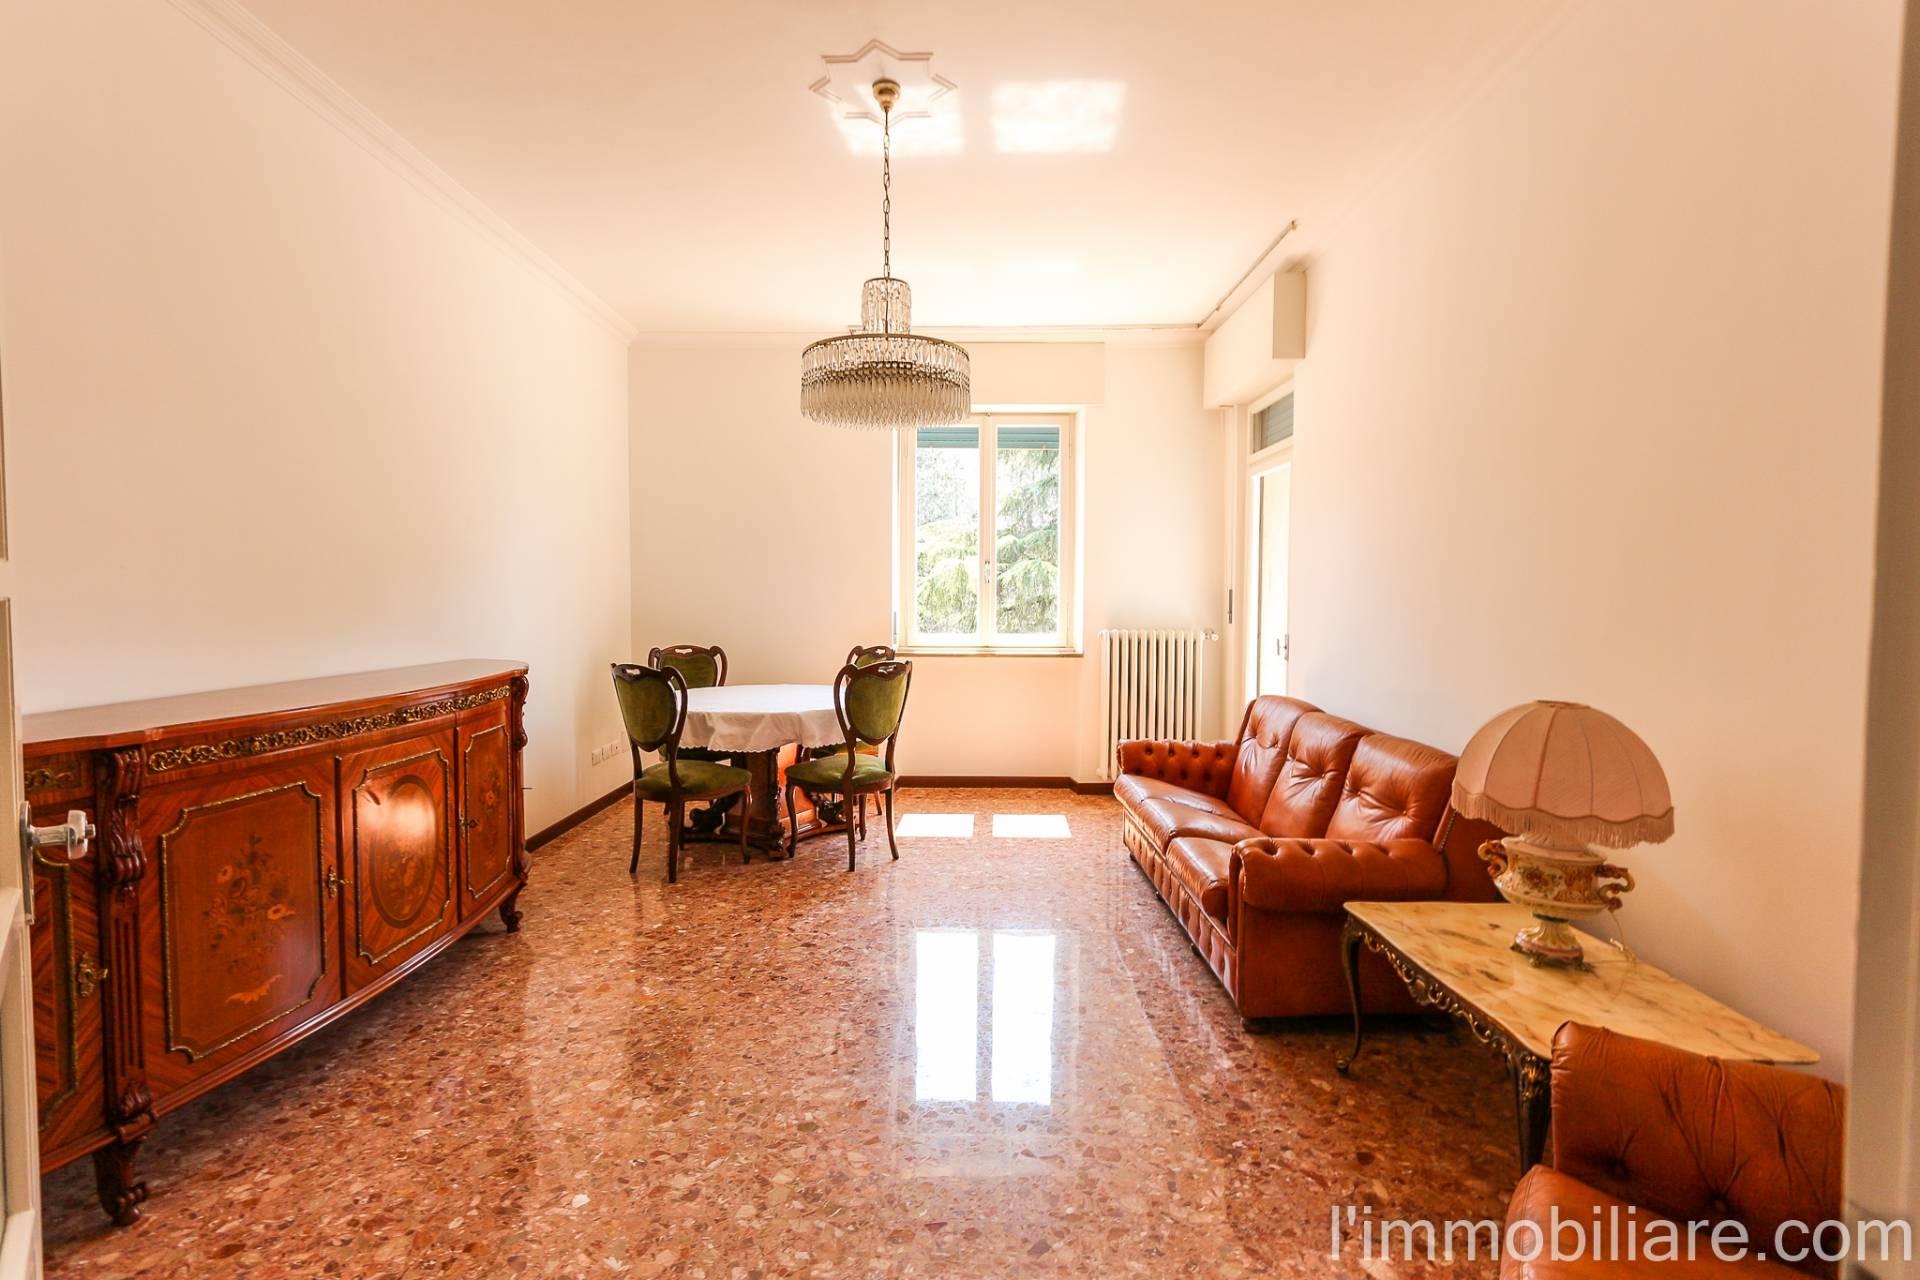 Vdf102 appartamento in affitto a verona pindemonte for Affitto arredato verona